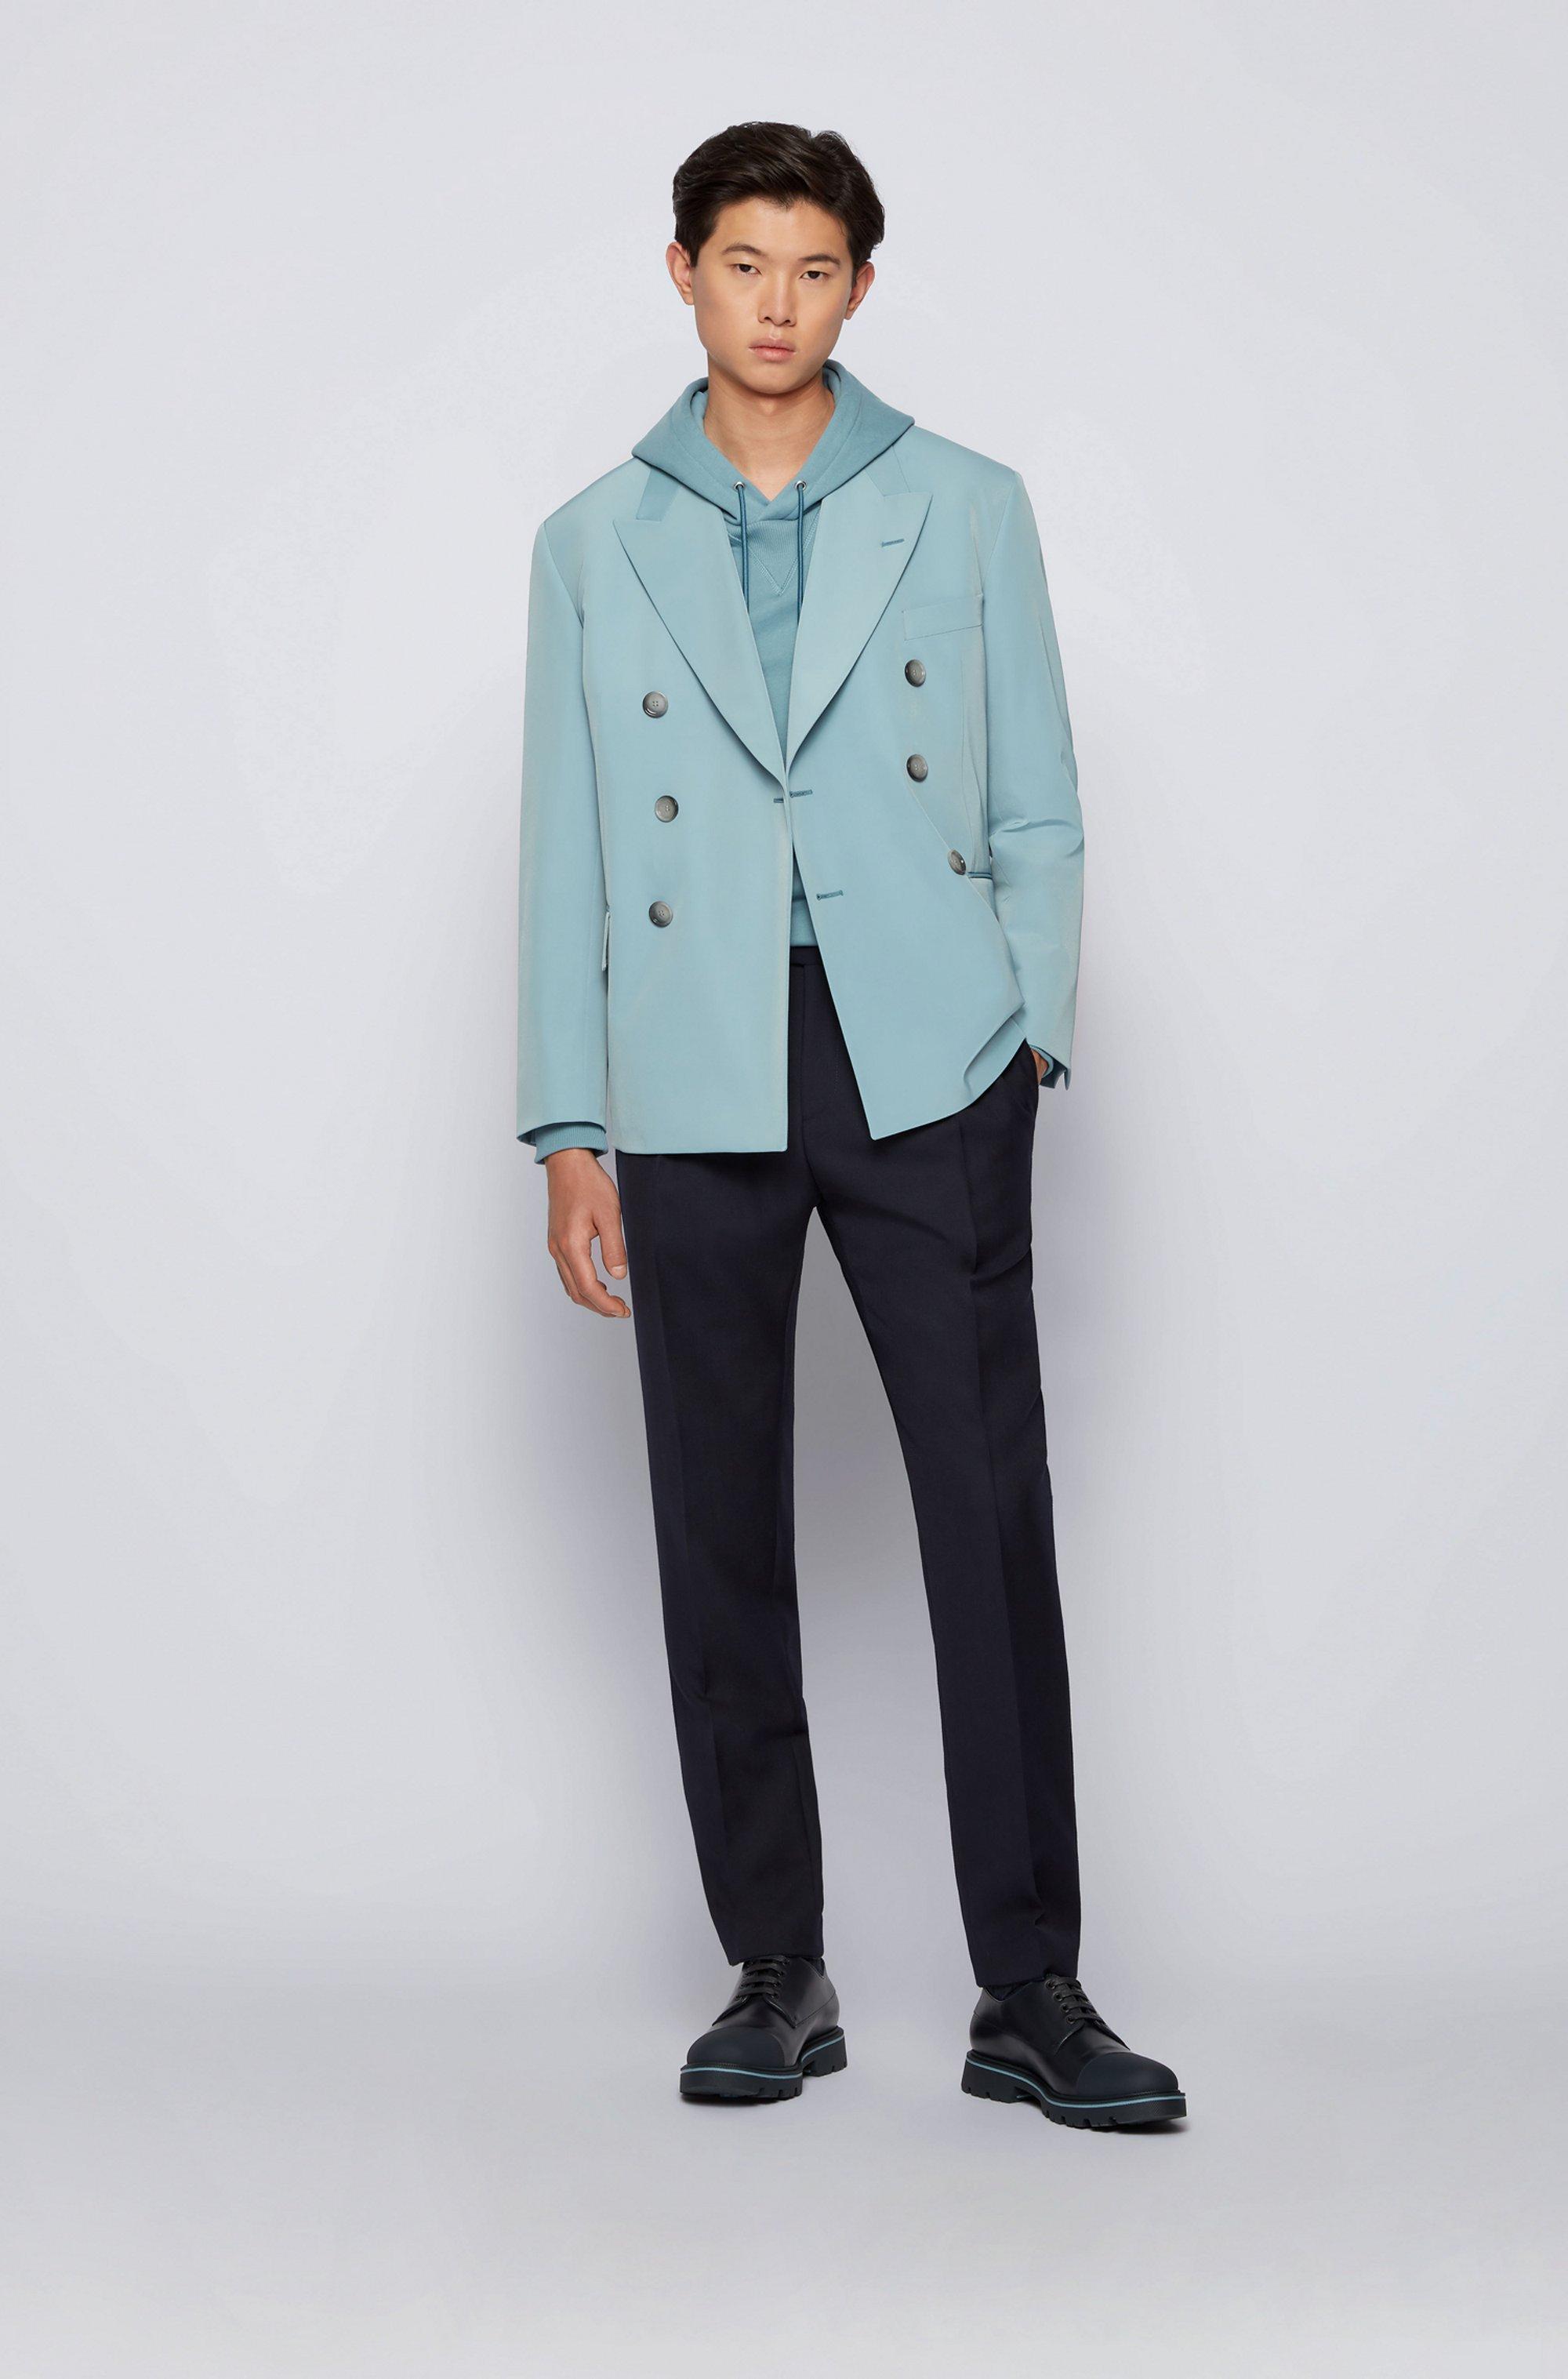 Double-breasted jacket in Italian twill